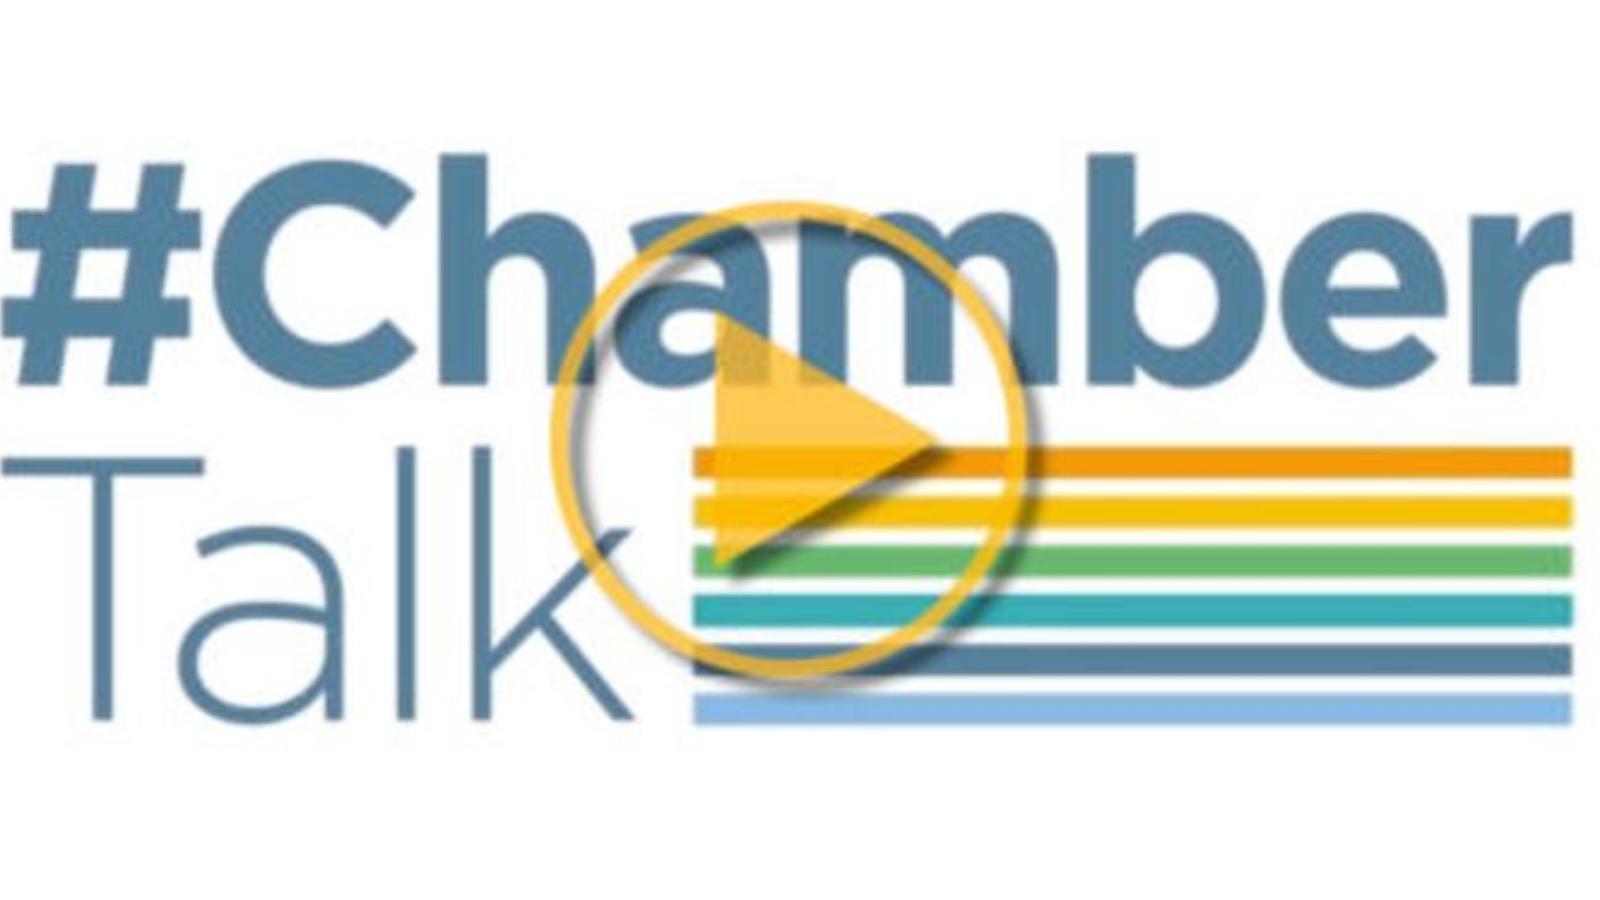 ChamberTalk: International trade update from Chamber chief executive Russell Borthwick